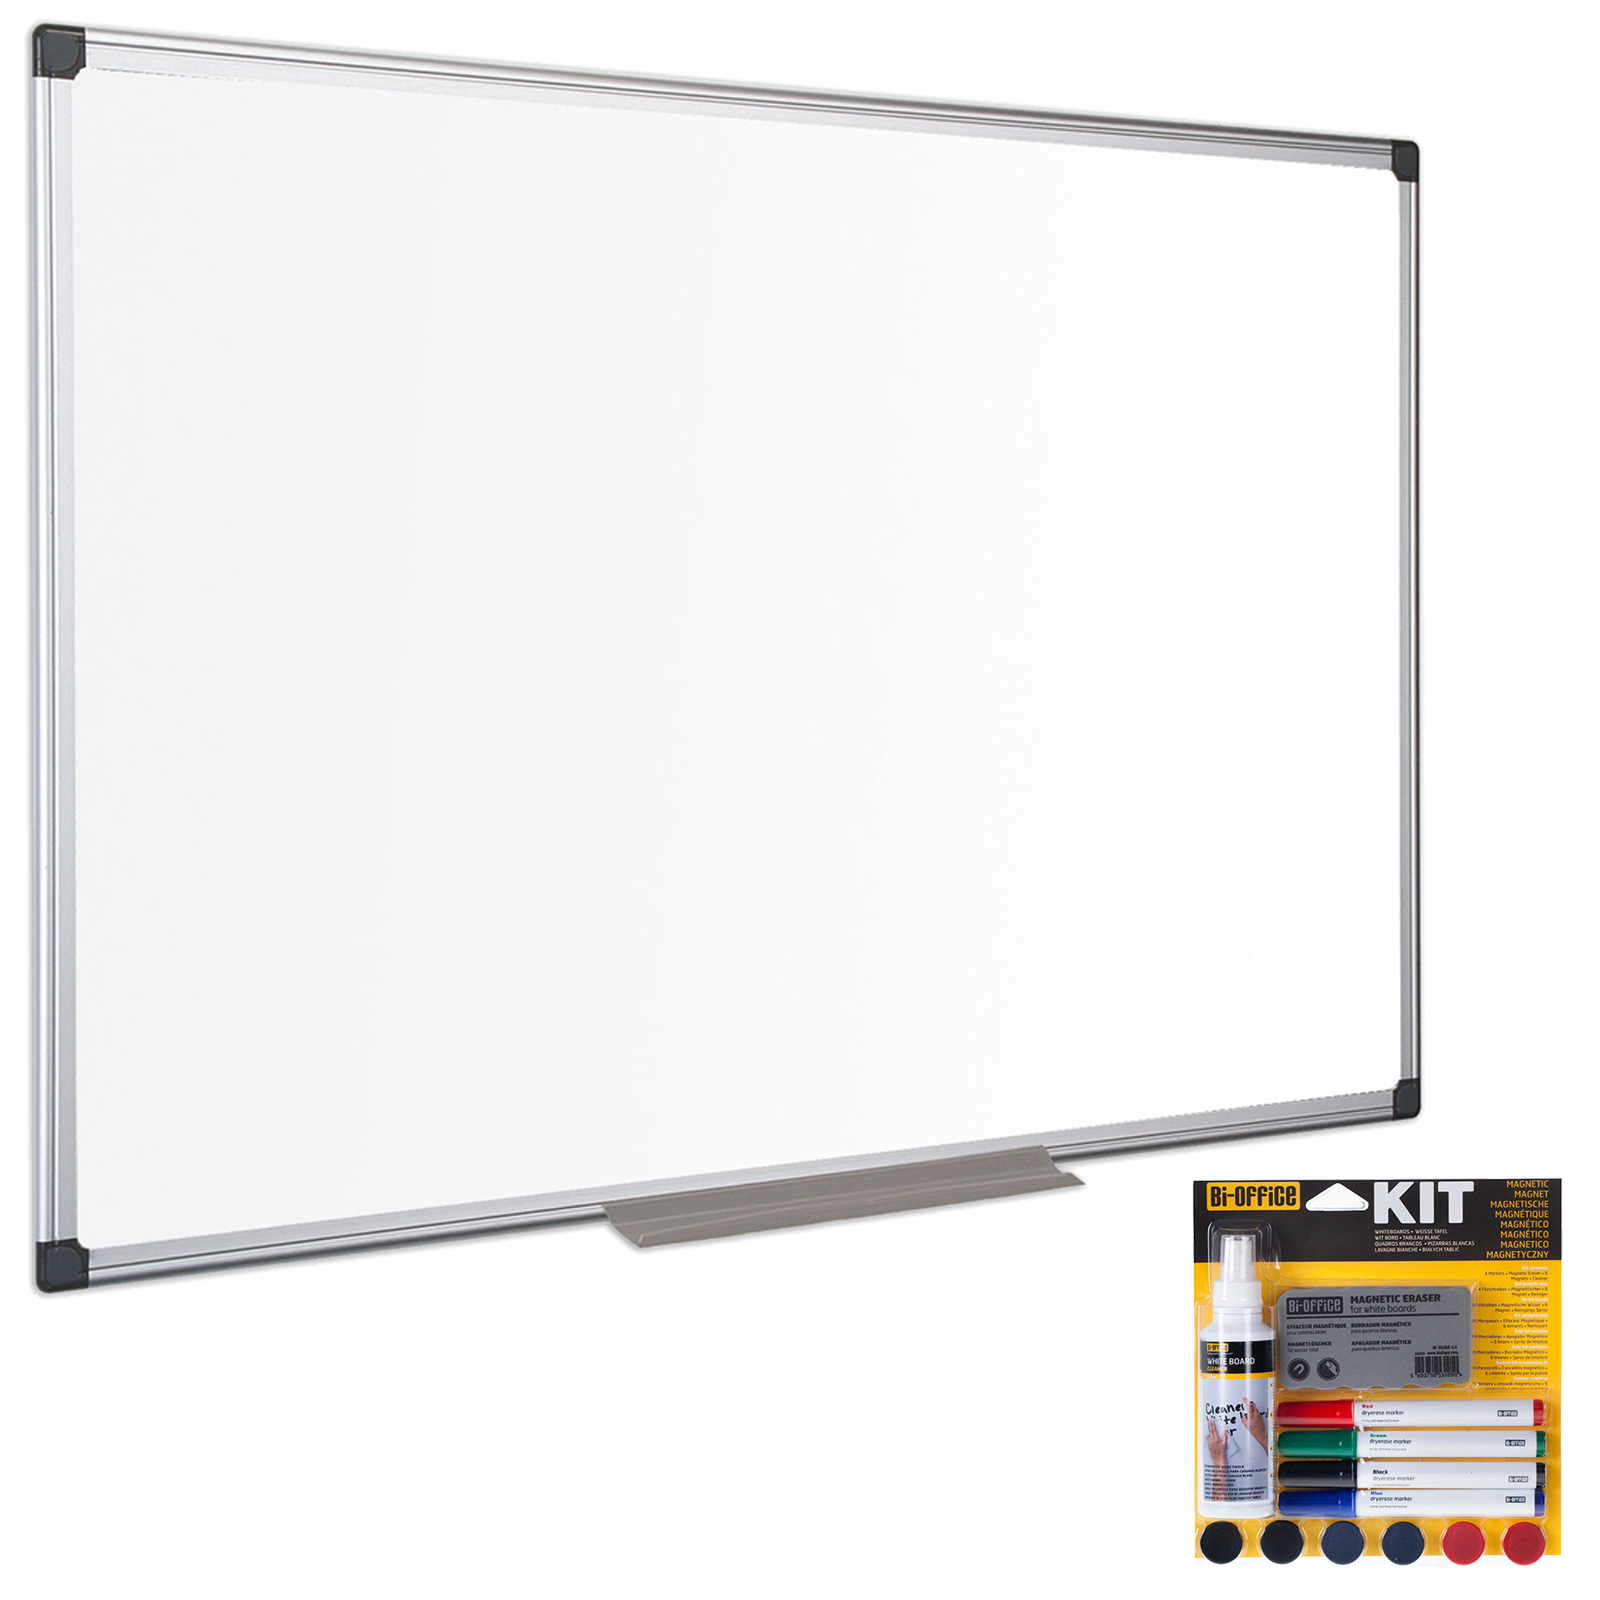 bi office tableau blanc maill 90 x 60 cm bi office kit. Black Bedroom Furniture Sets. Home Design Ideas